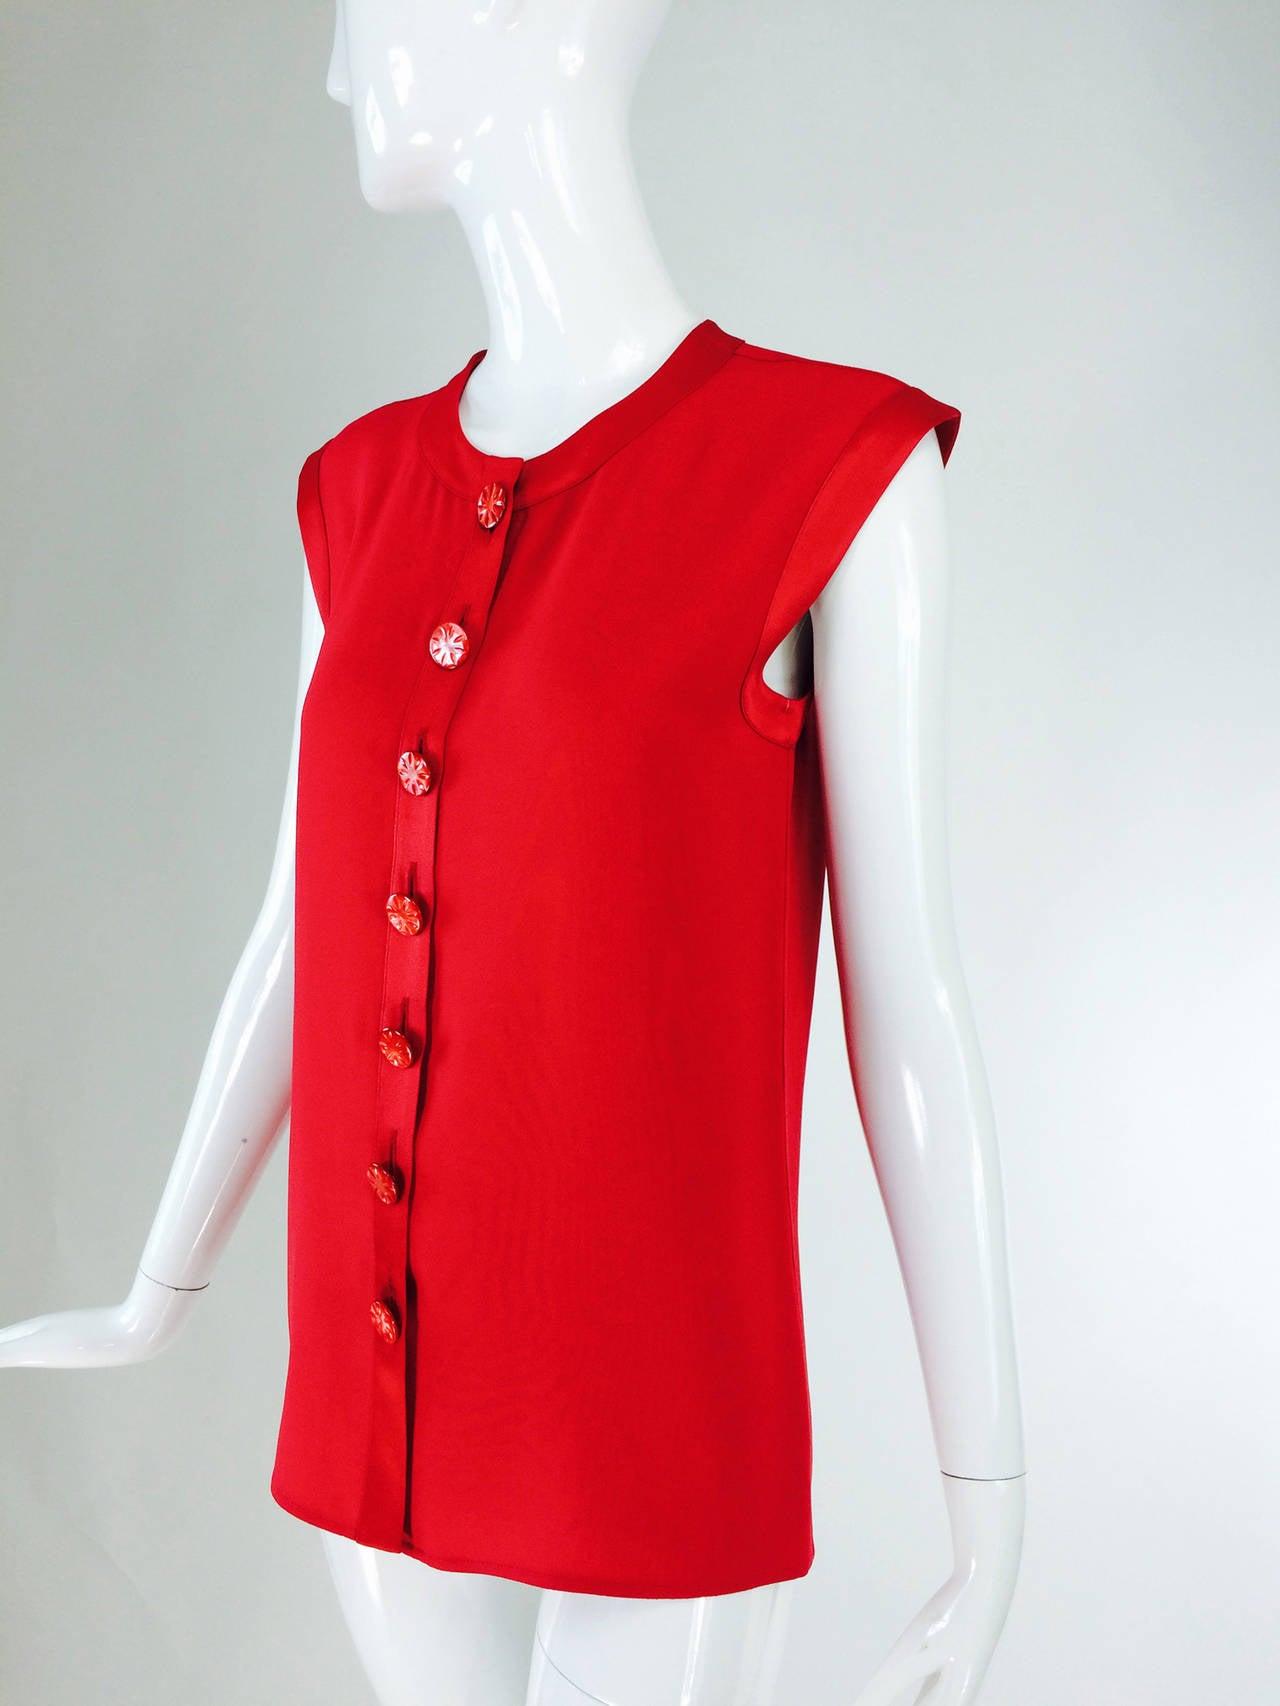 Yves St Laurent YSL Rive Gauche red satin back crepe sleeveless top 7